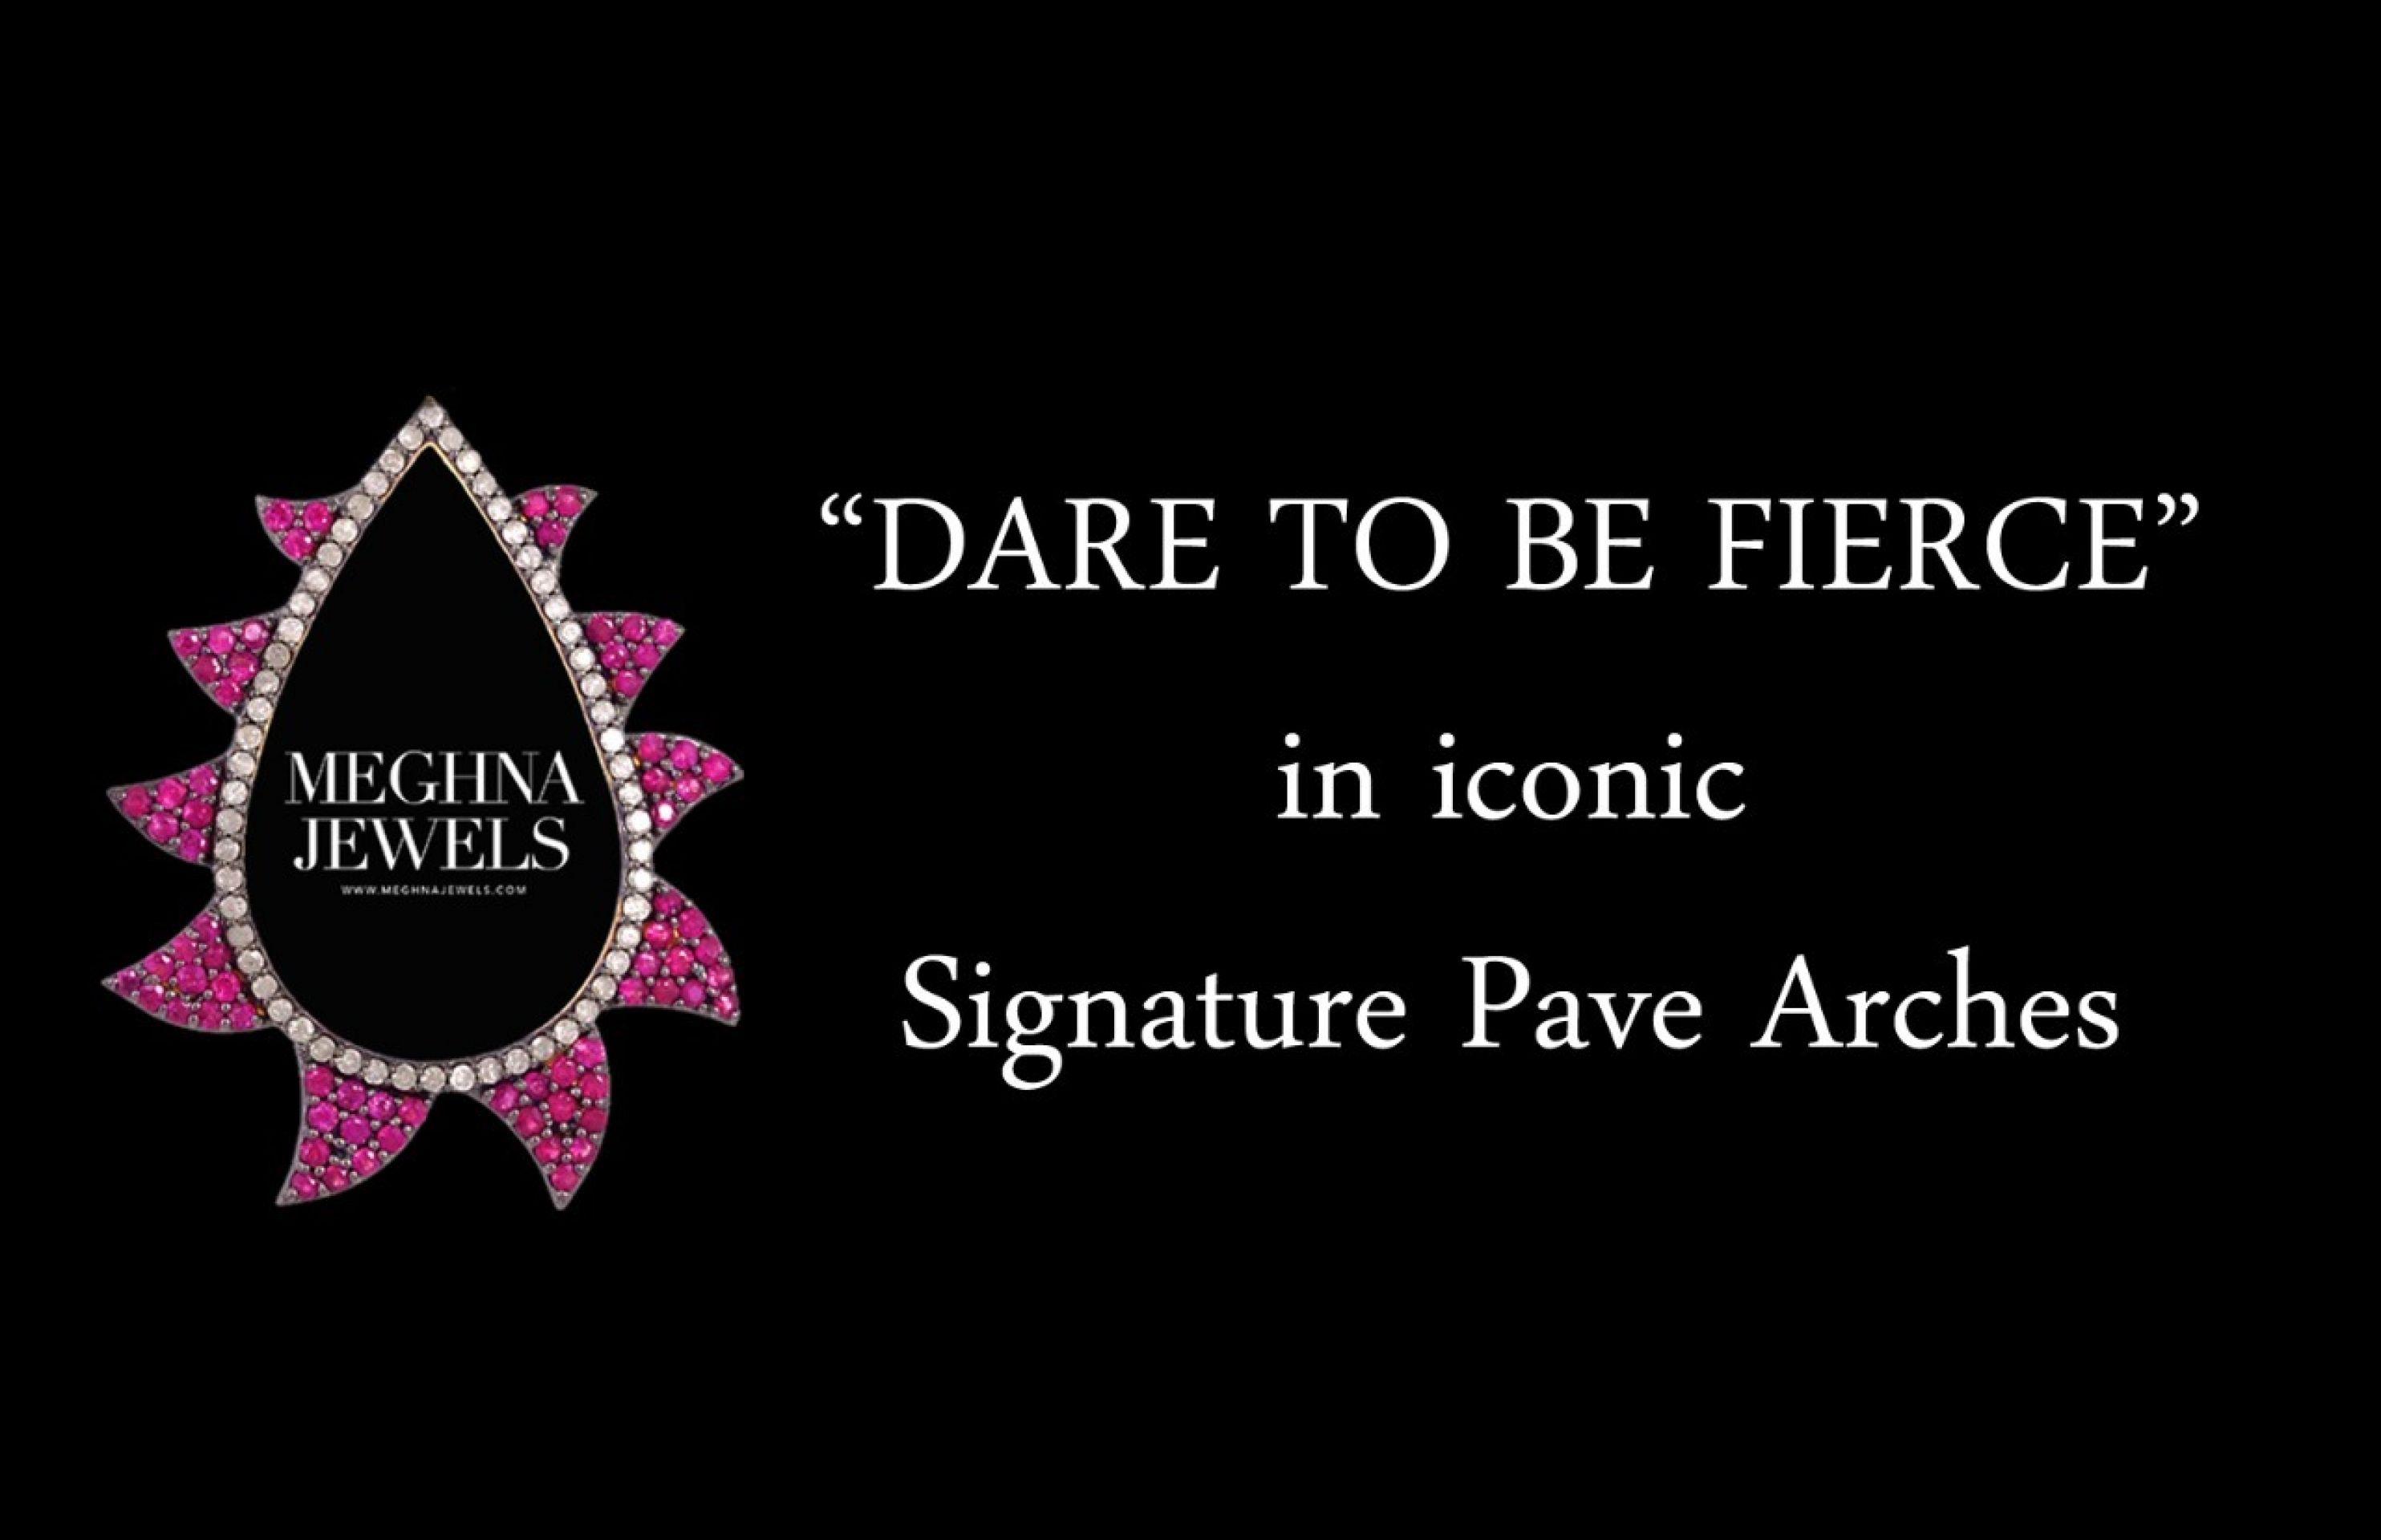 Meghna Jewels Flame Earrings Rainbow Moonstone & Diamonds